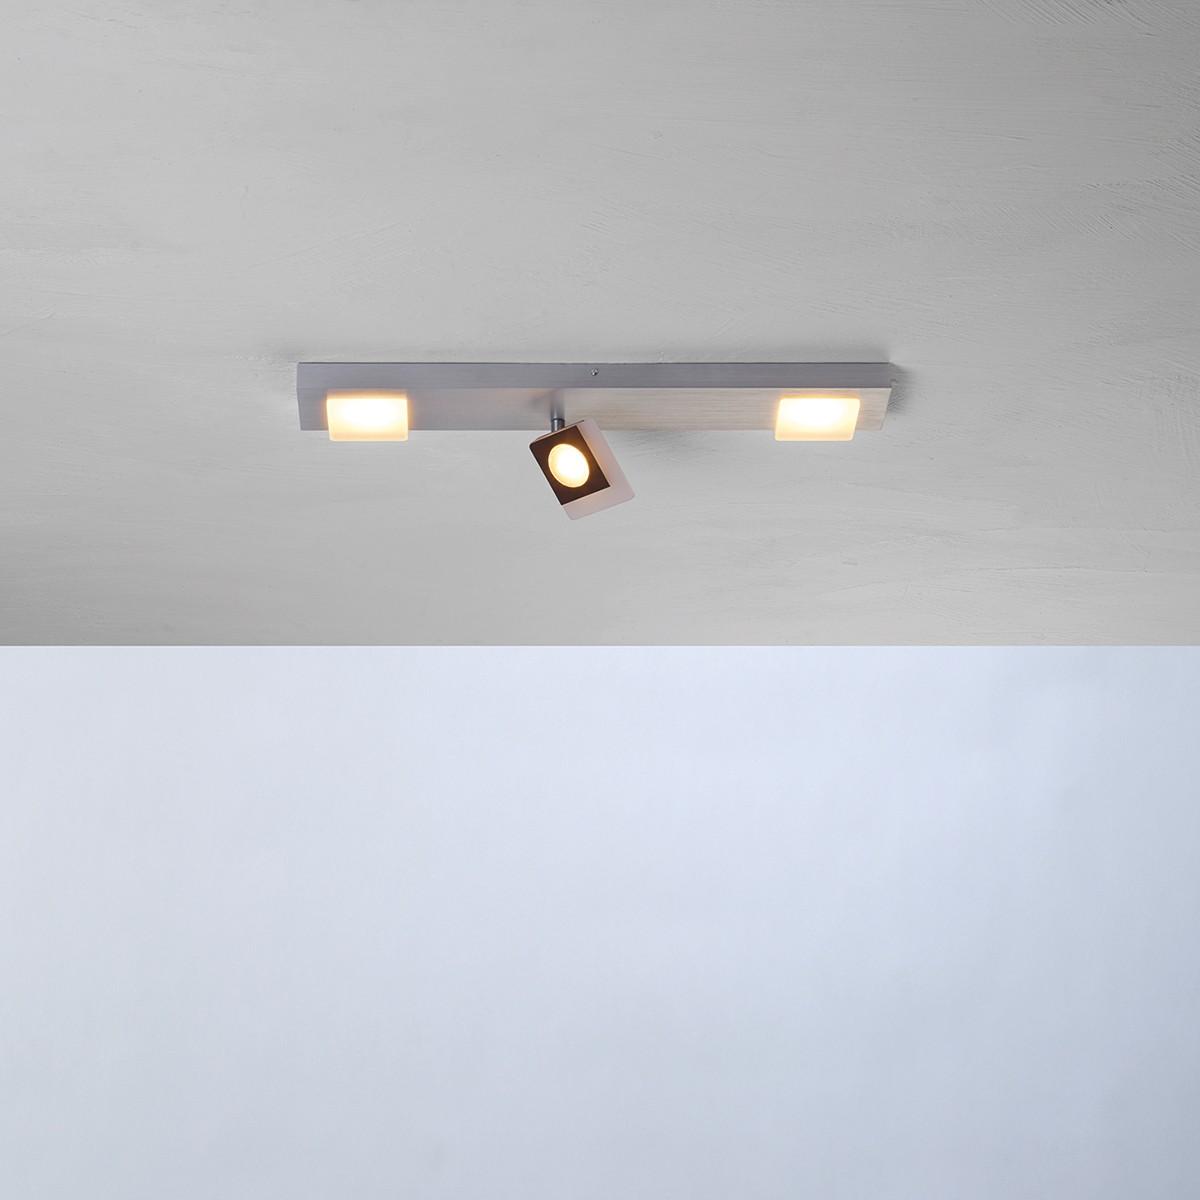 Bopp Session LED Deckenleuchte, 3-flg., Aluminium geschliffen